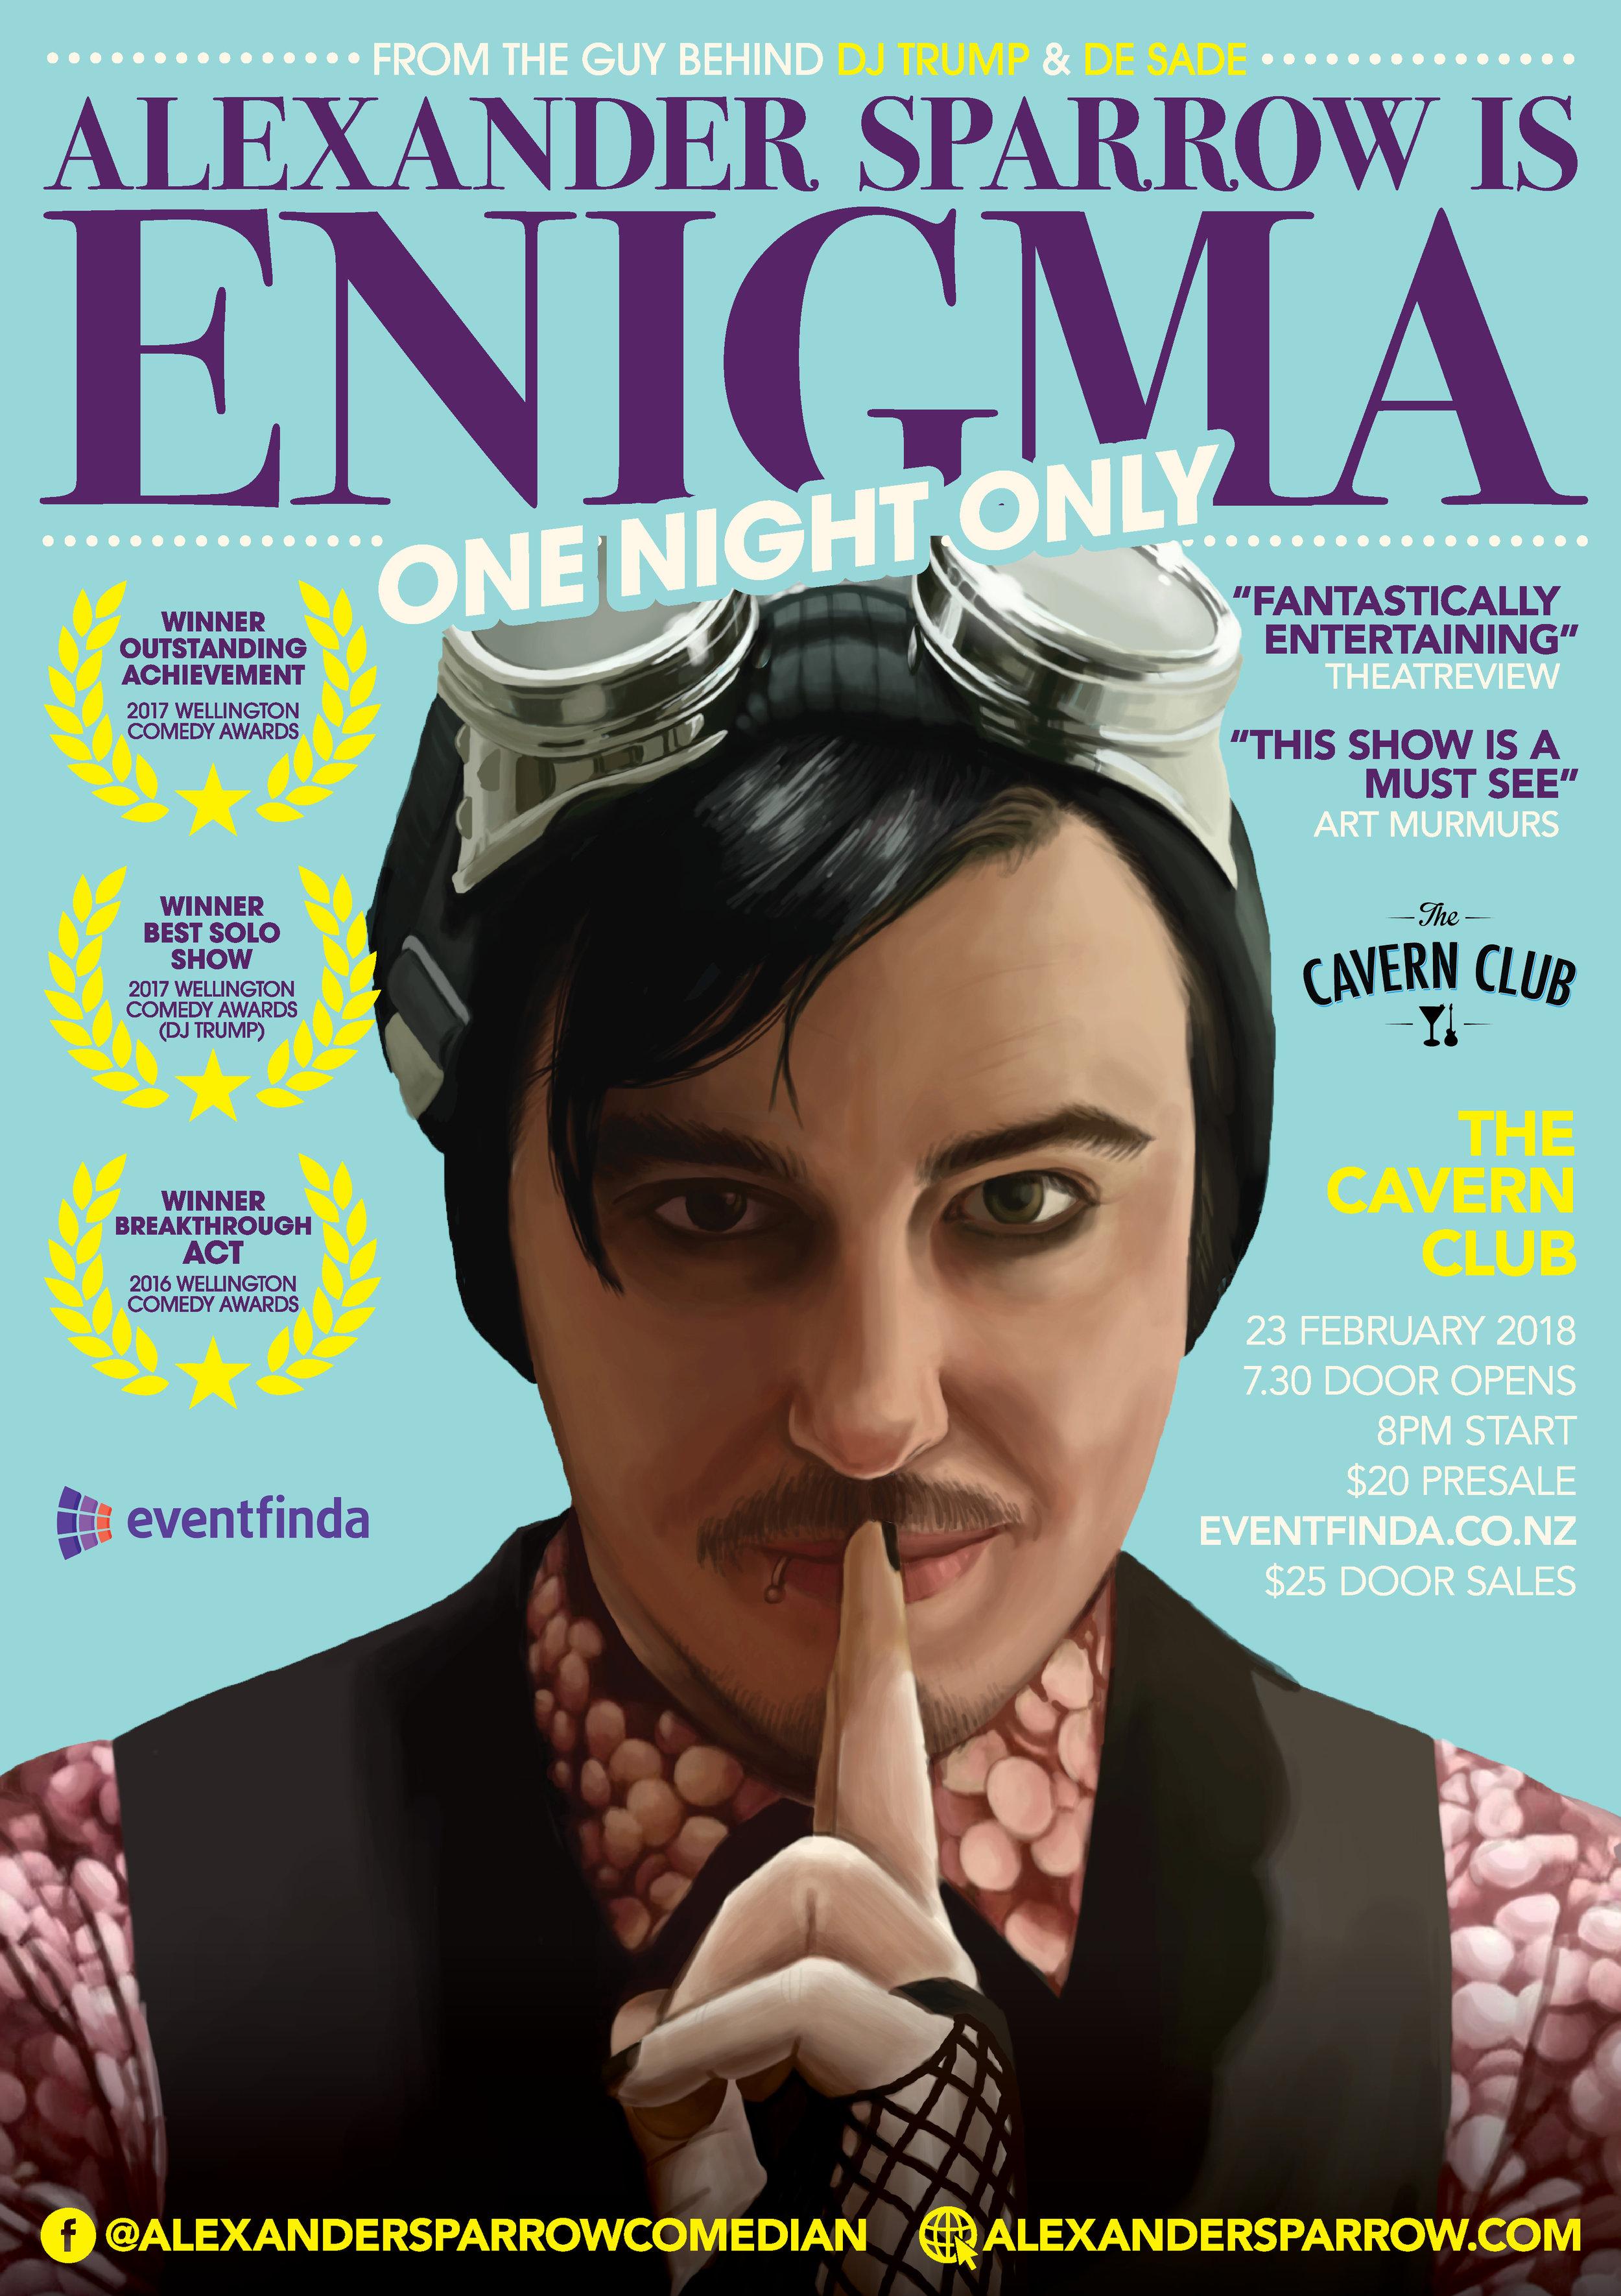 ENIGMA Feb 2018 poster.jpg